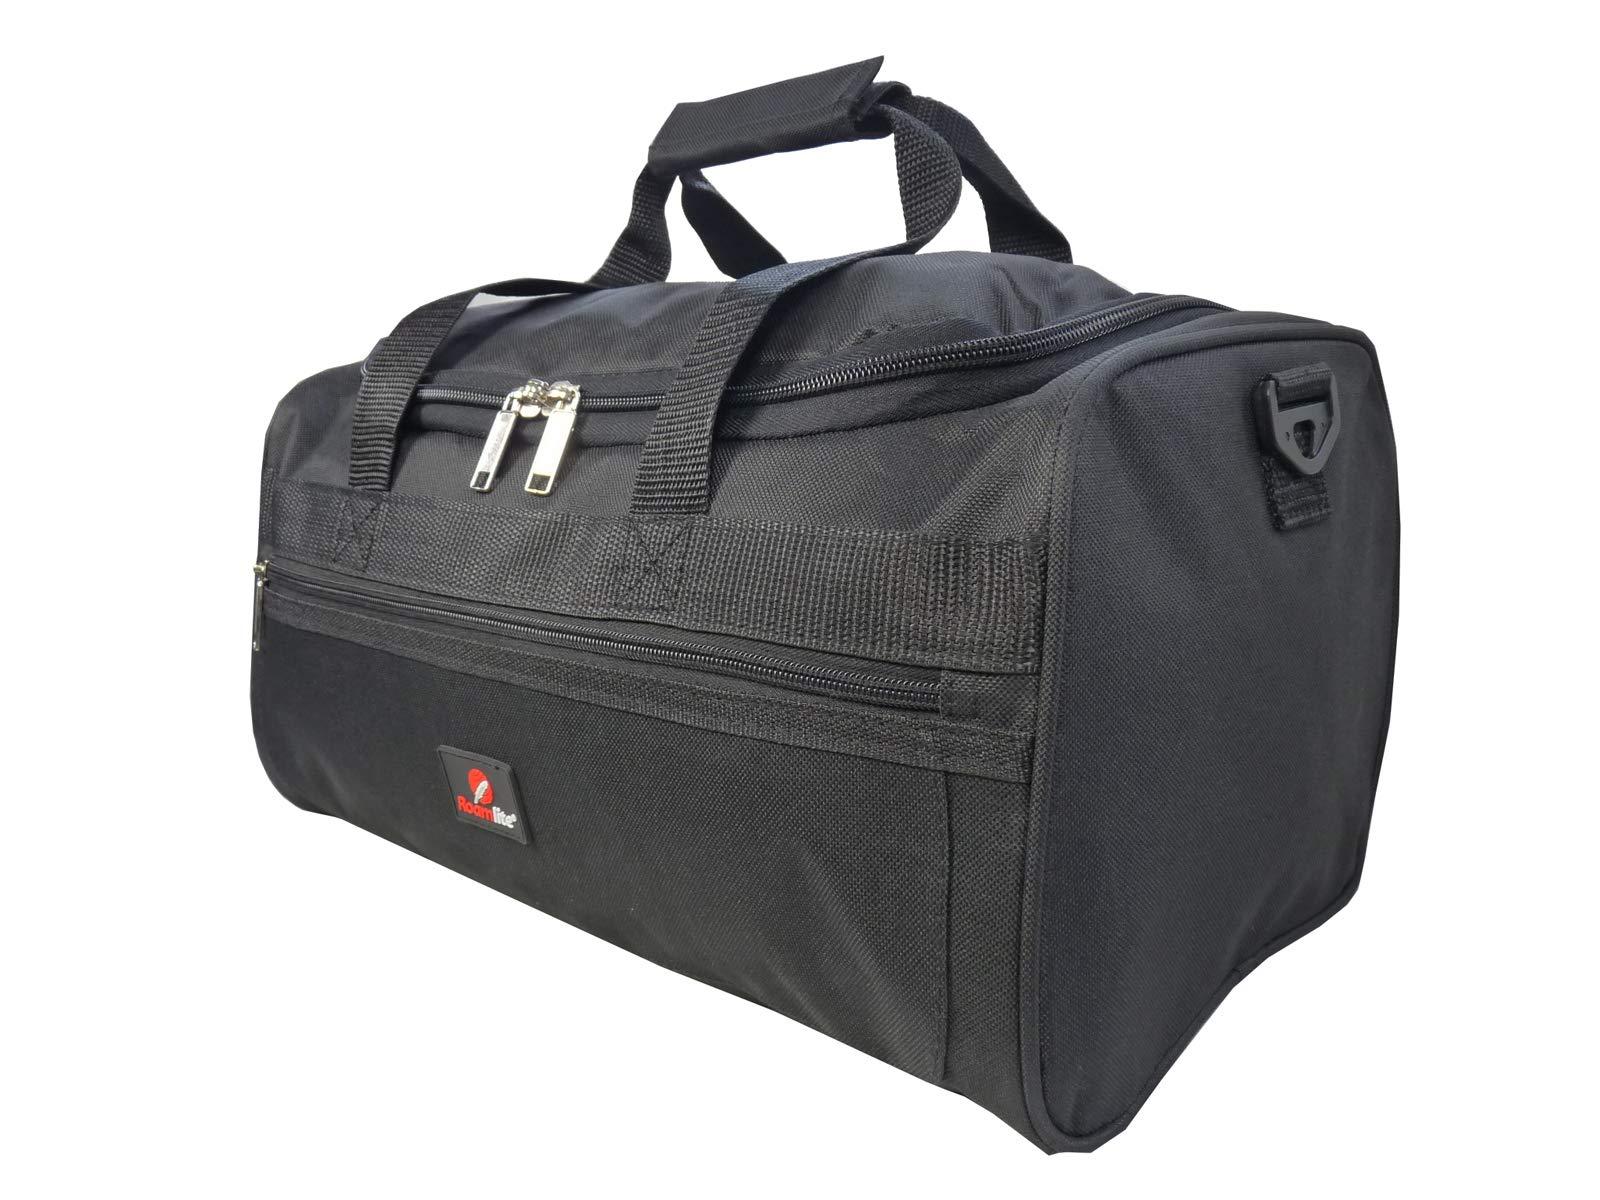 0dab0bfae Roamlite Small Hand Luggage Holdalls - Ryanair 2nd Item Size Travel Bags -  Polyester 40 x25x20